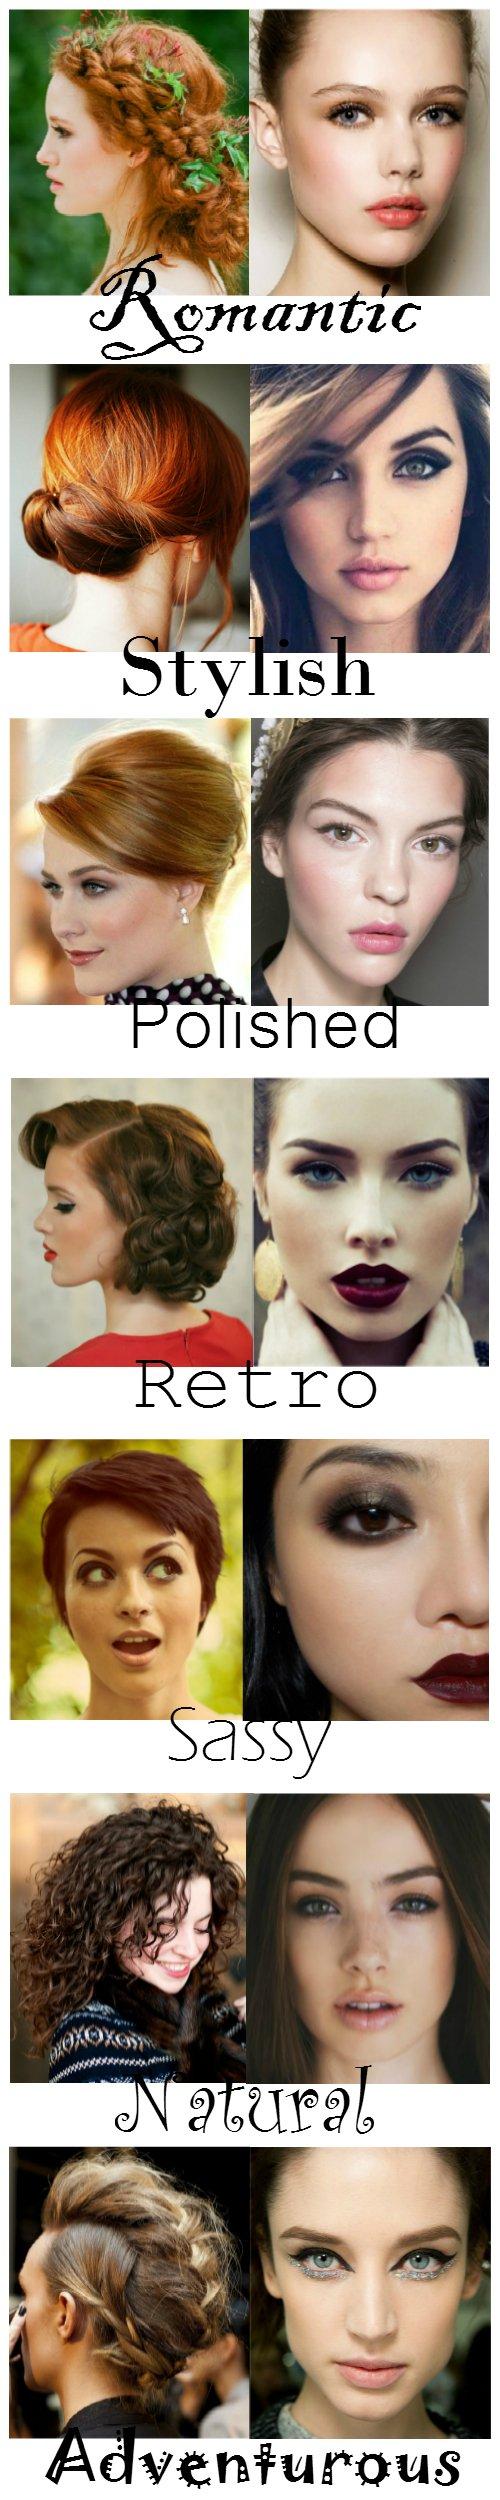 stylish,polished,romantic,natural,sassy,retro,adventurous